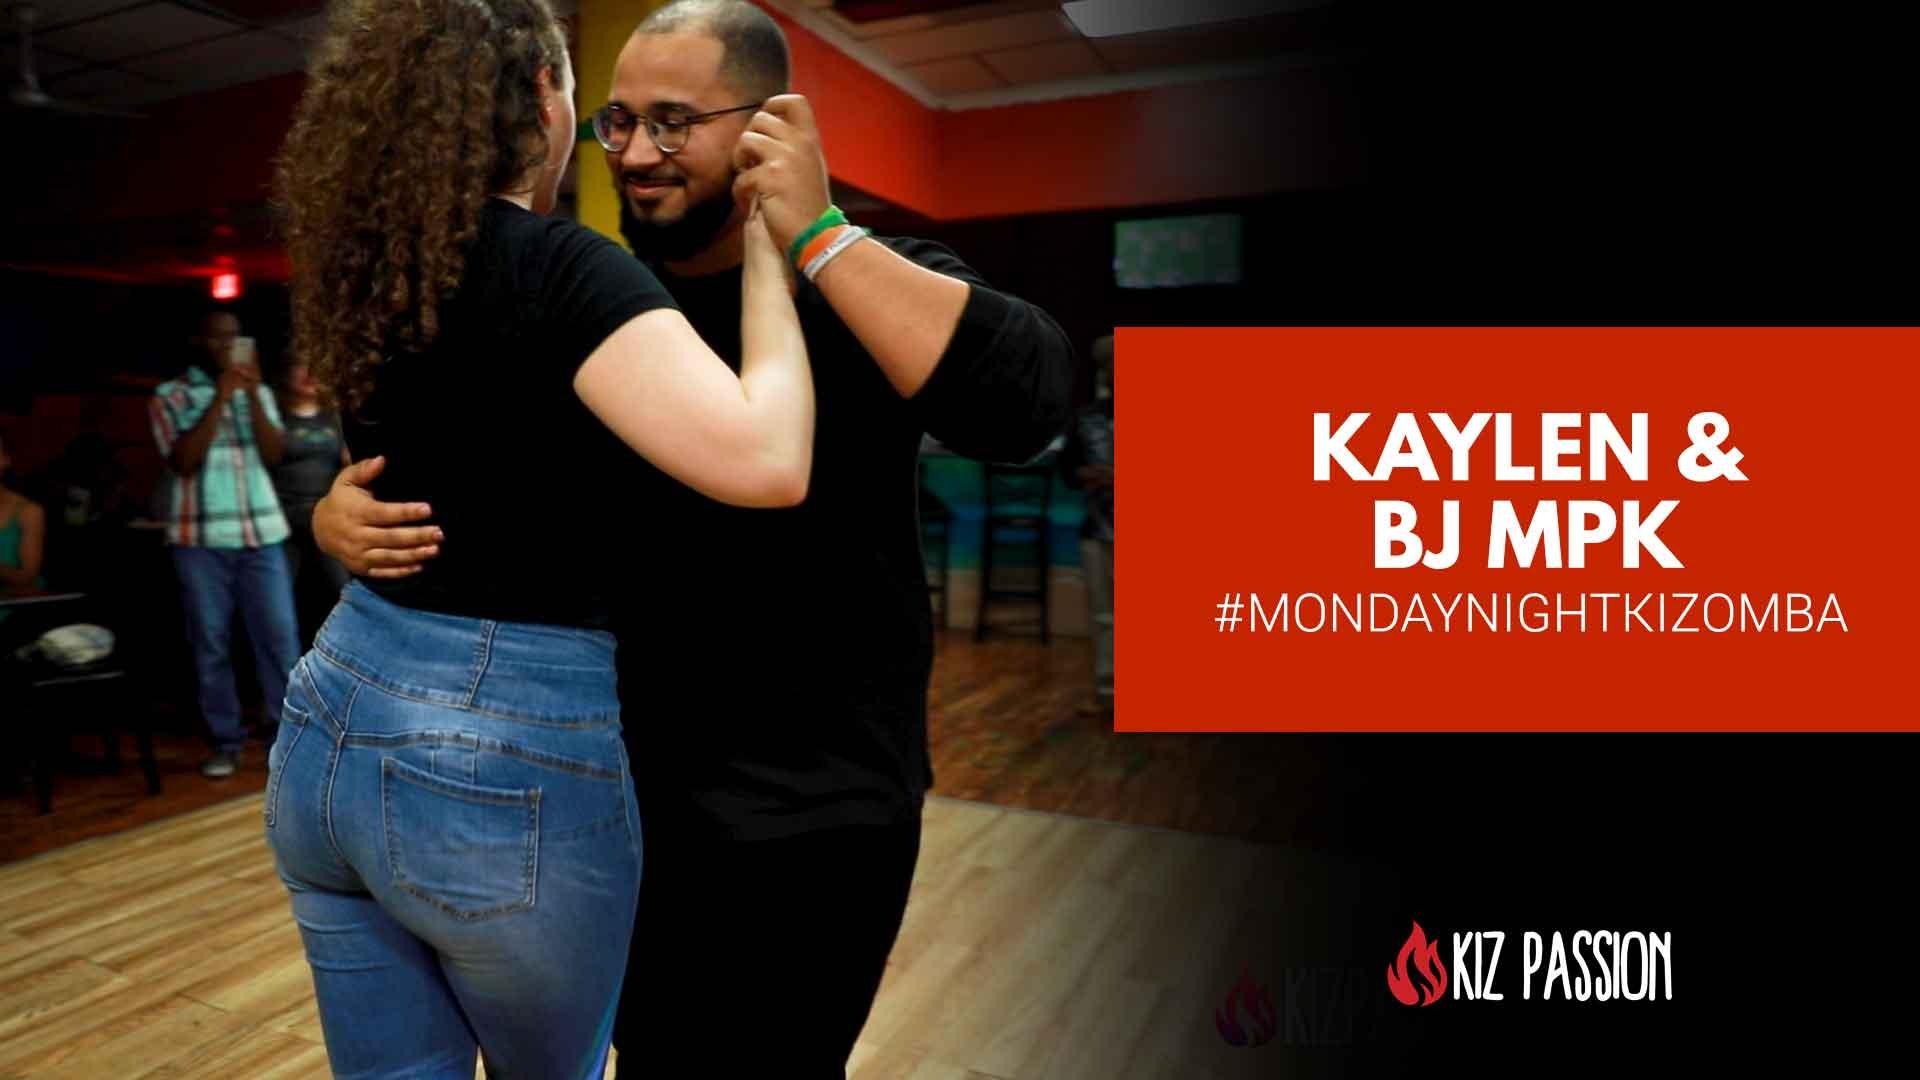 Kaylen & BJ MPK Demo from #MondayNightKizomba Social